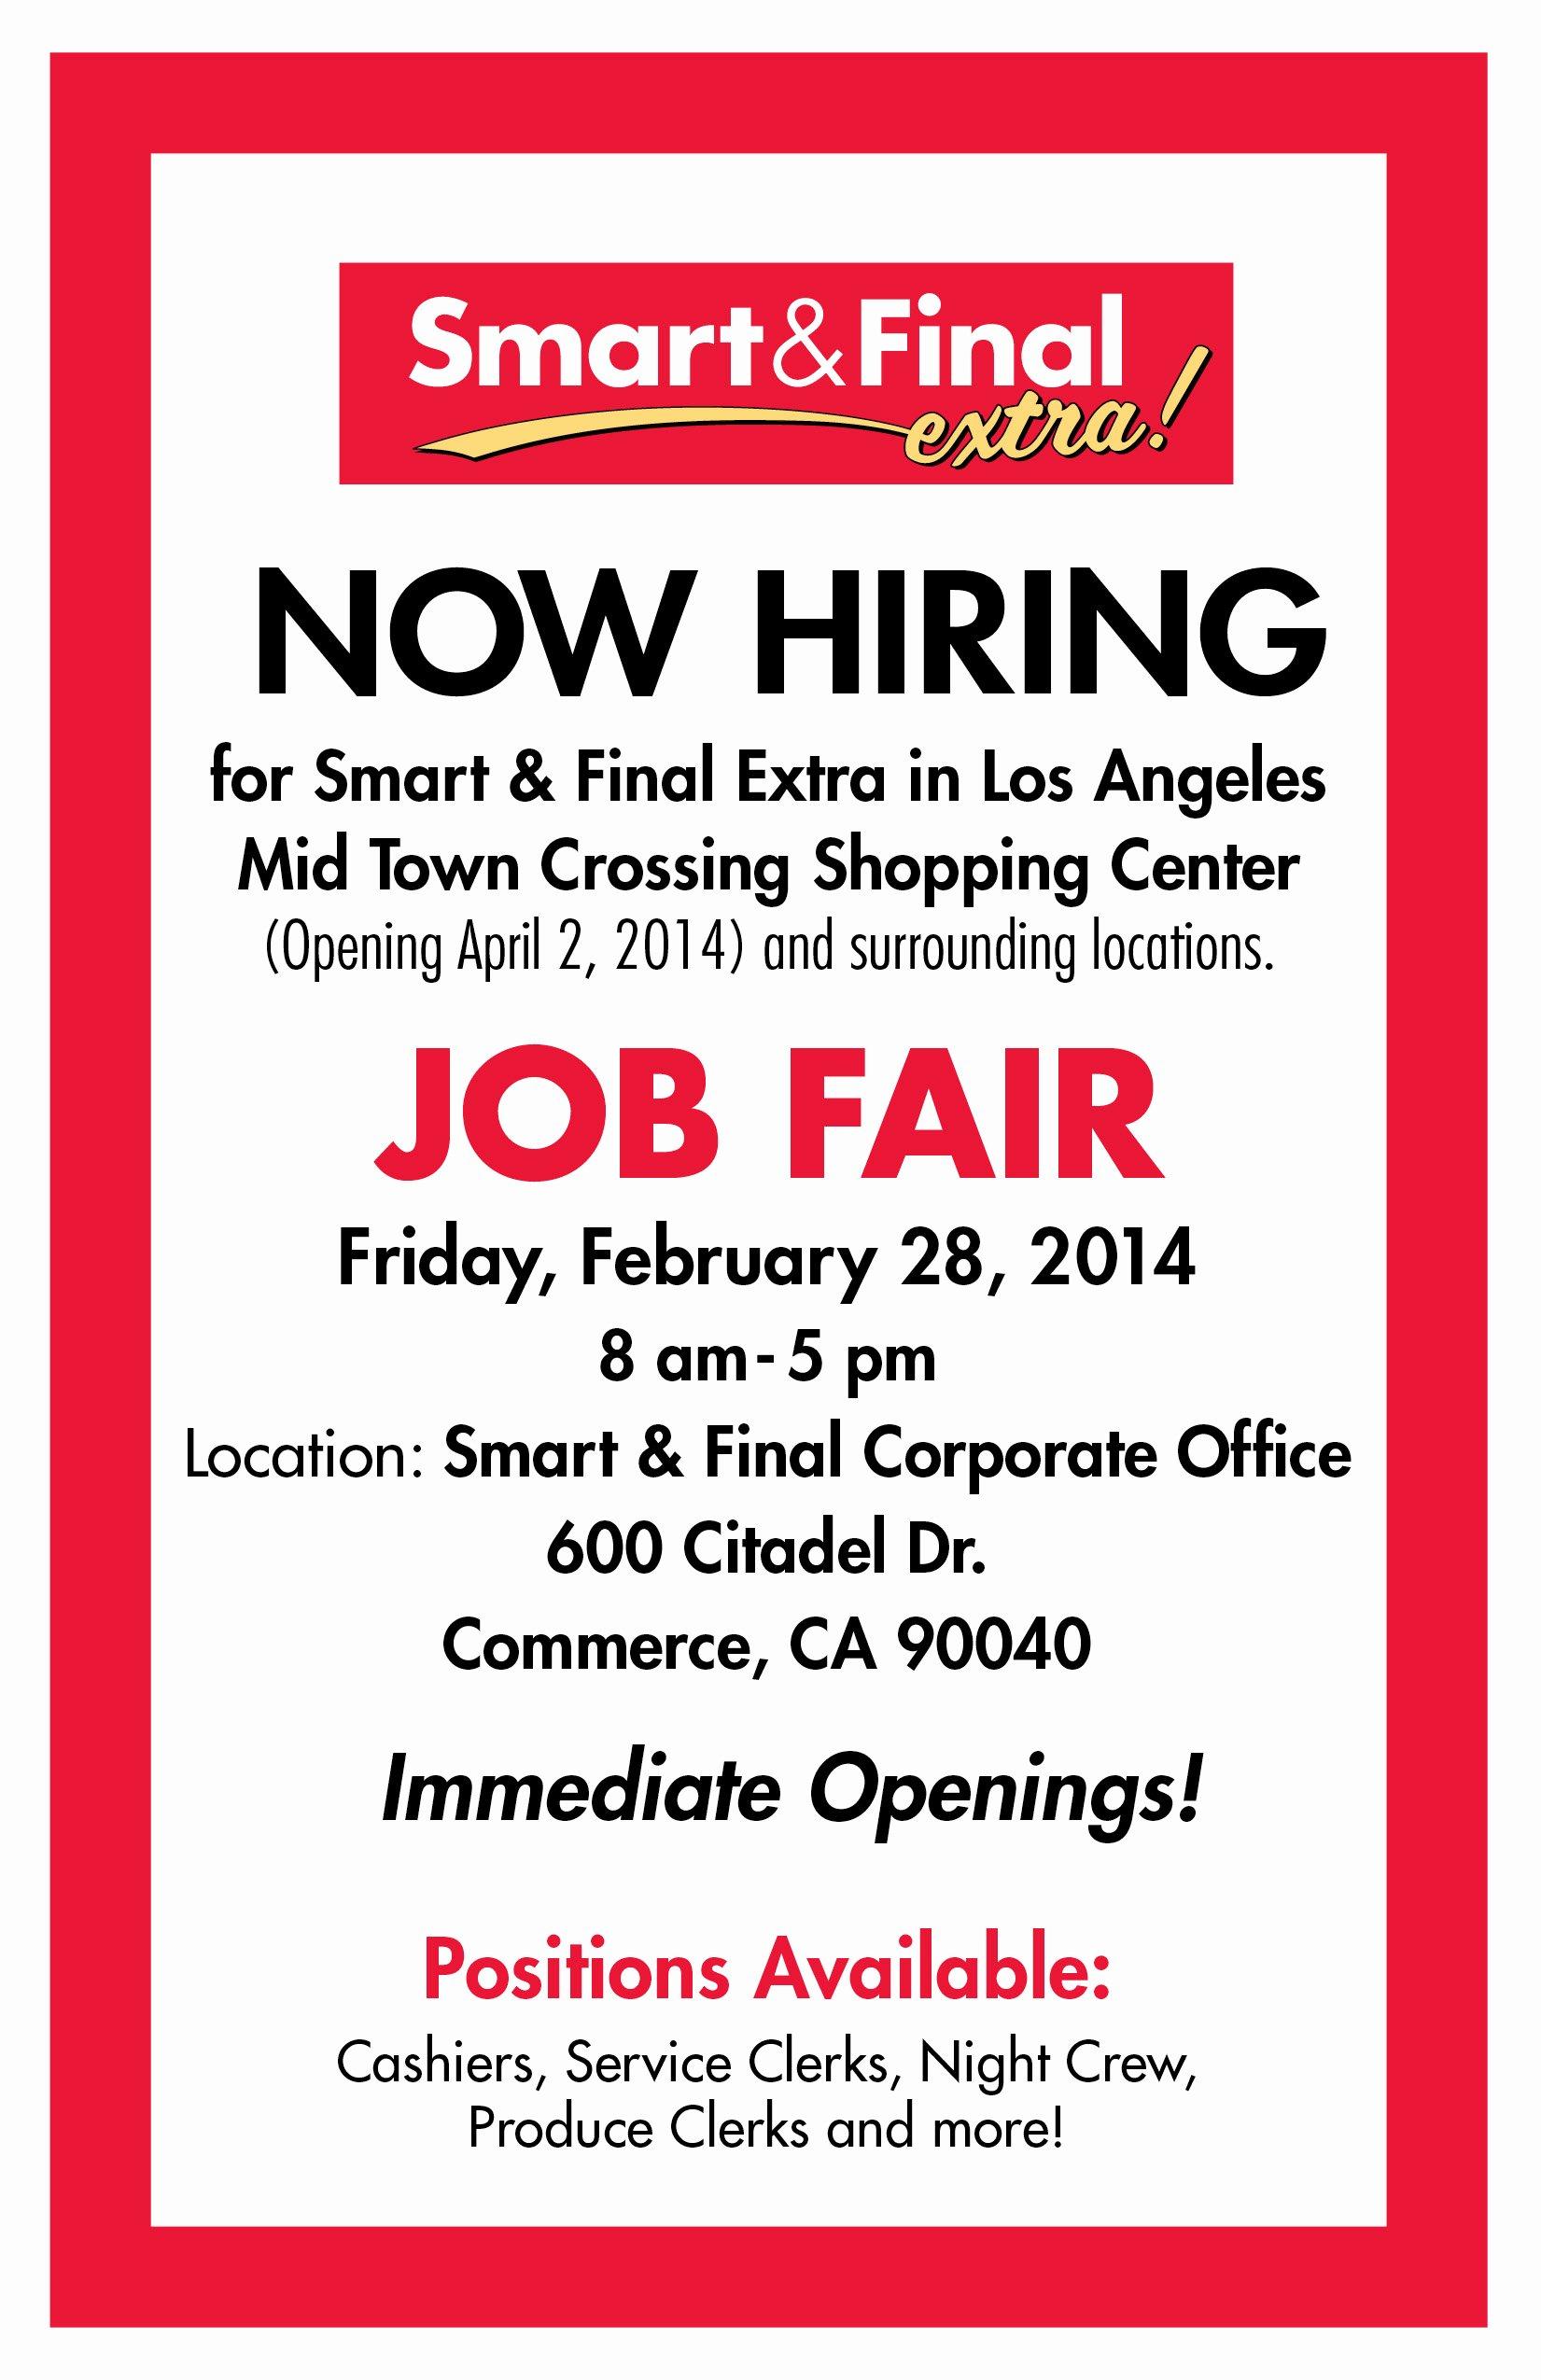 Job Flyer Template Word Beautiful Smart & Final Mid town Crossing – now Hiring – Job Fair